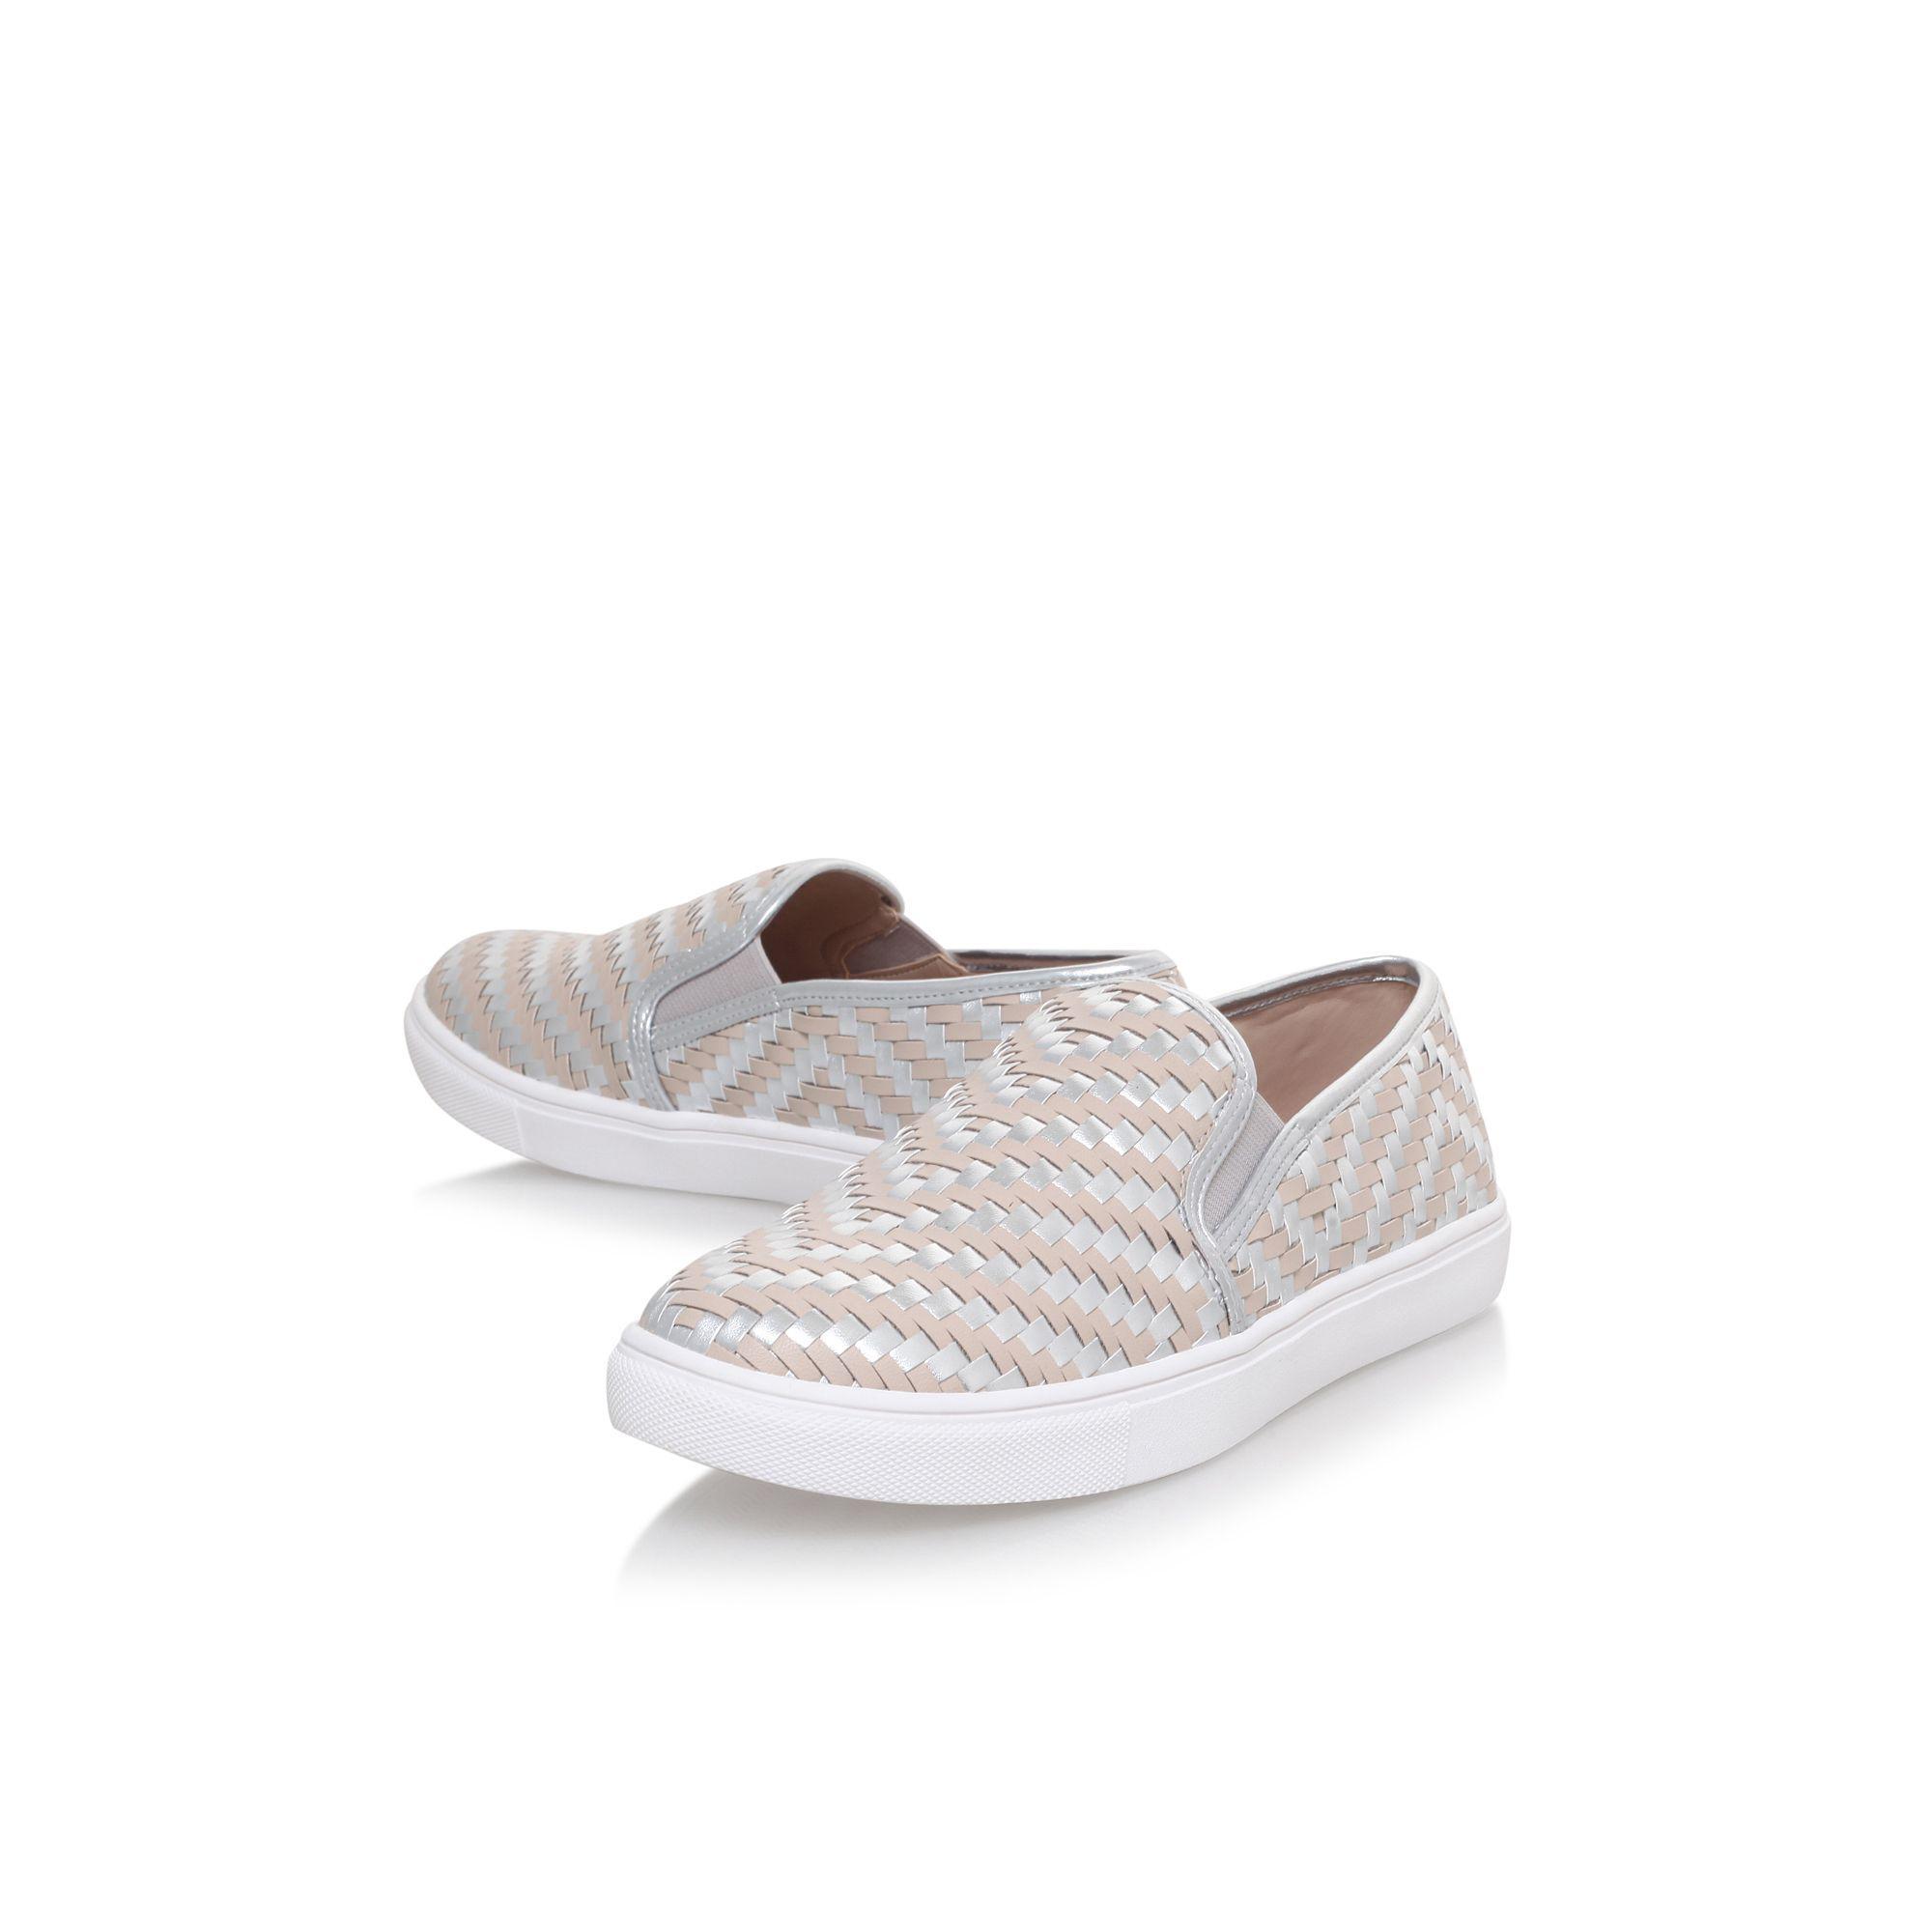 Carvela Kurt Geiger Synthetic Grey 'jinx' Flat Slip On Sneakers in Grey